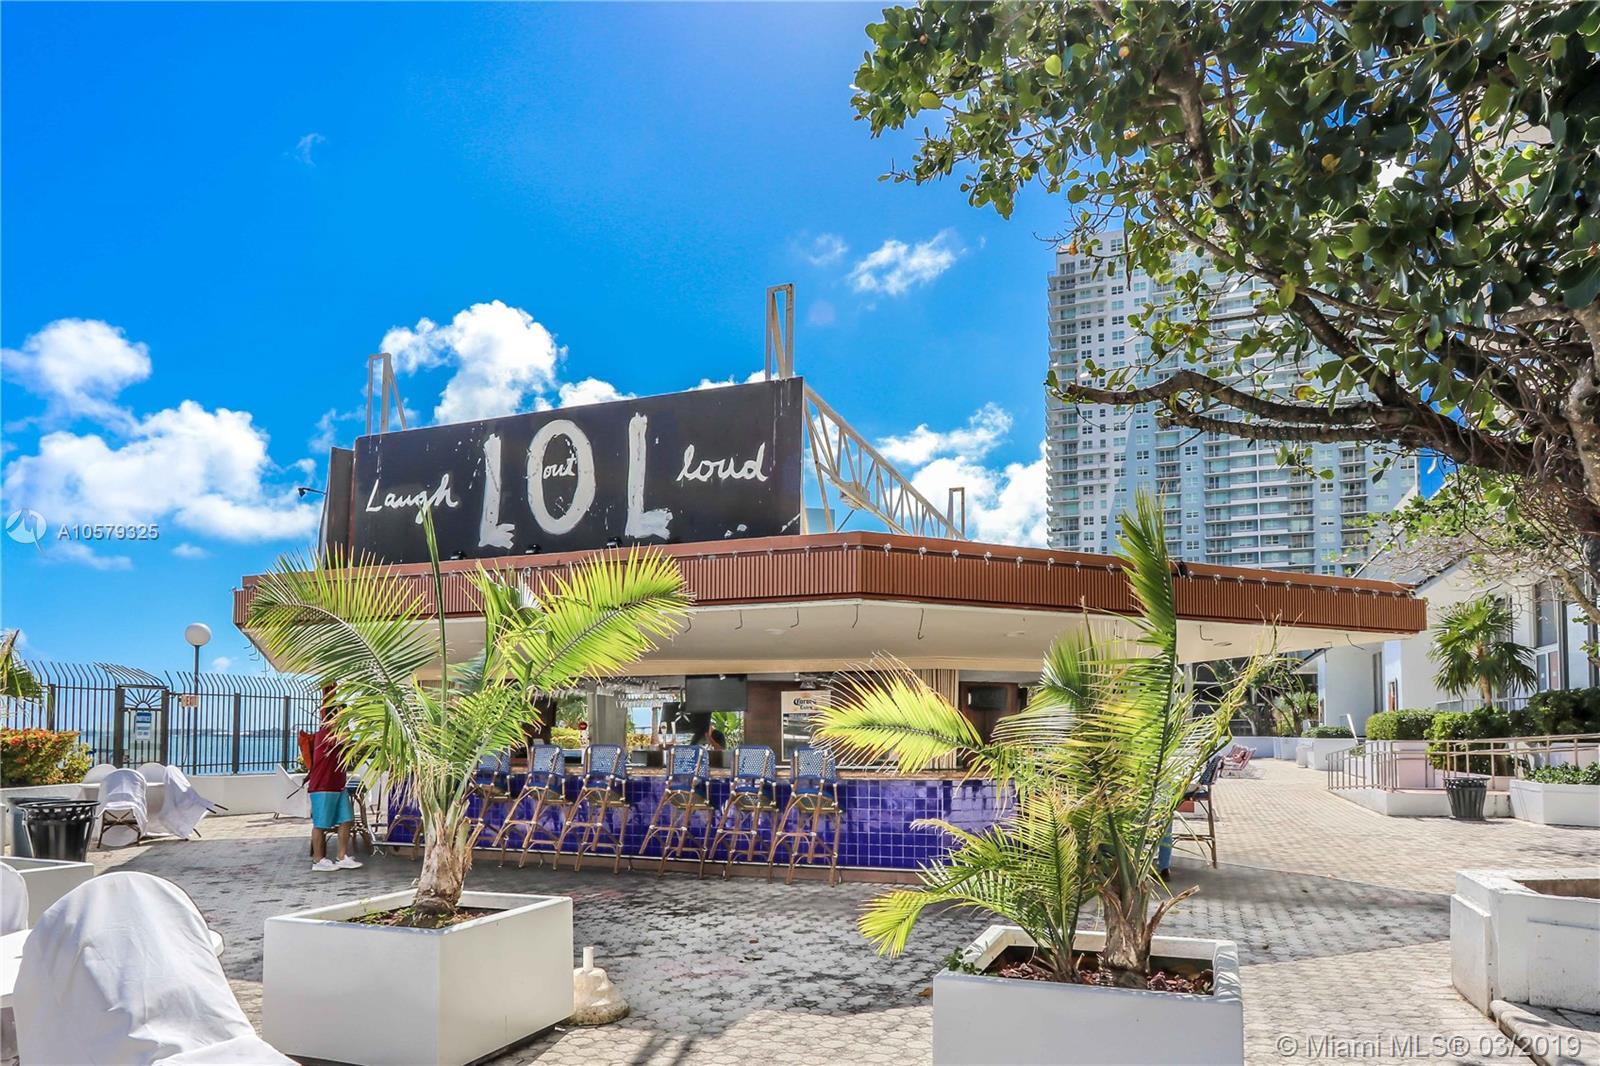 905 Brickell Bay Drive, Miami, FL 33131, Four Ambassadors #408, Brickell, Miami A10579325 image #22